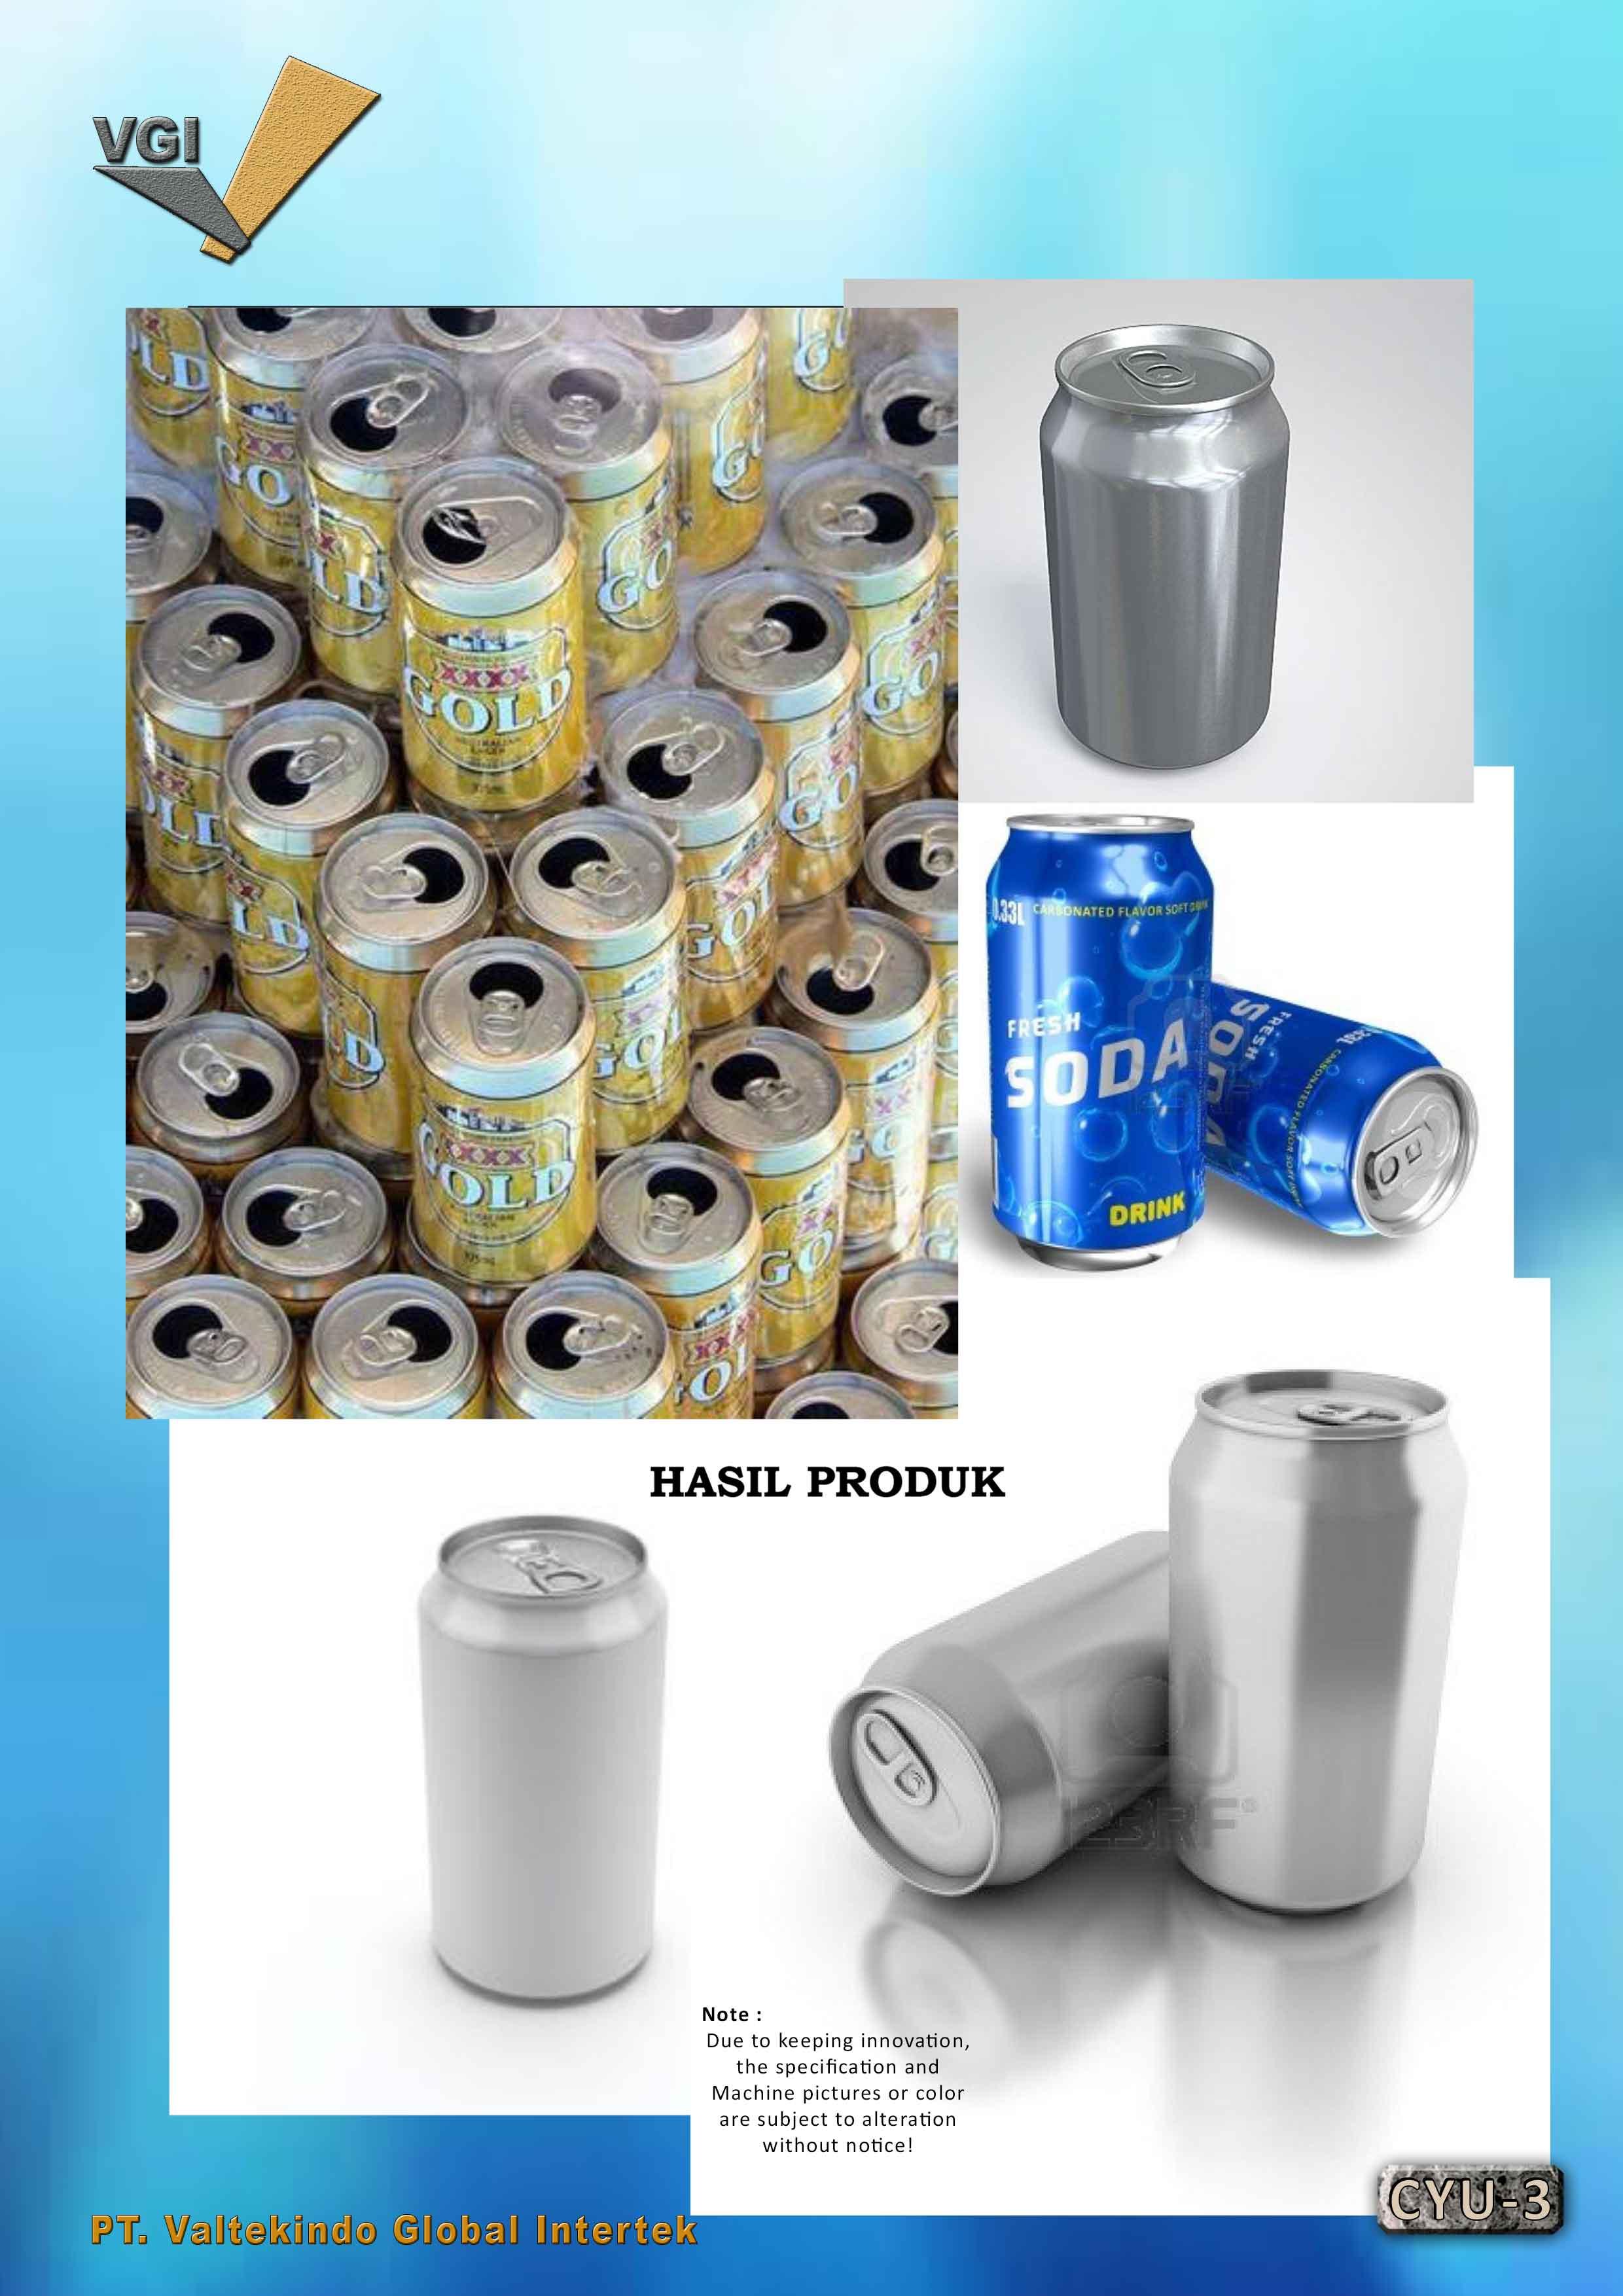 jual mesin, harga mesin, jual mesin bandung, distributor mesin, jual mesin karet, daur ulang karet, daur ulang plastik, mesin pertanian Hasil Produk Hasil Produk